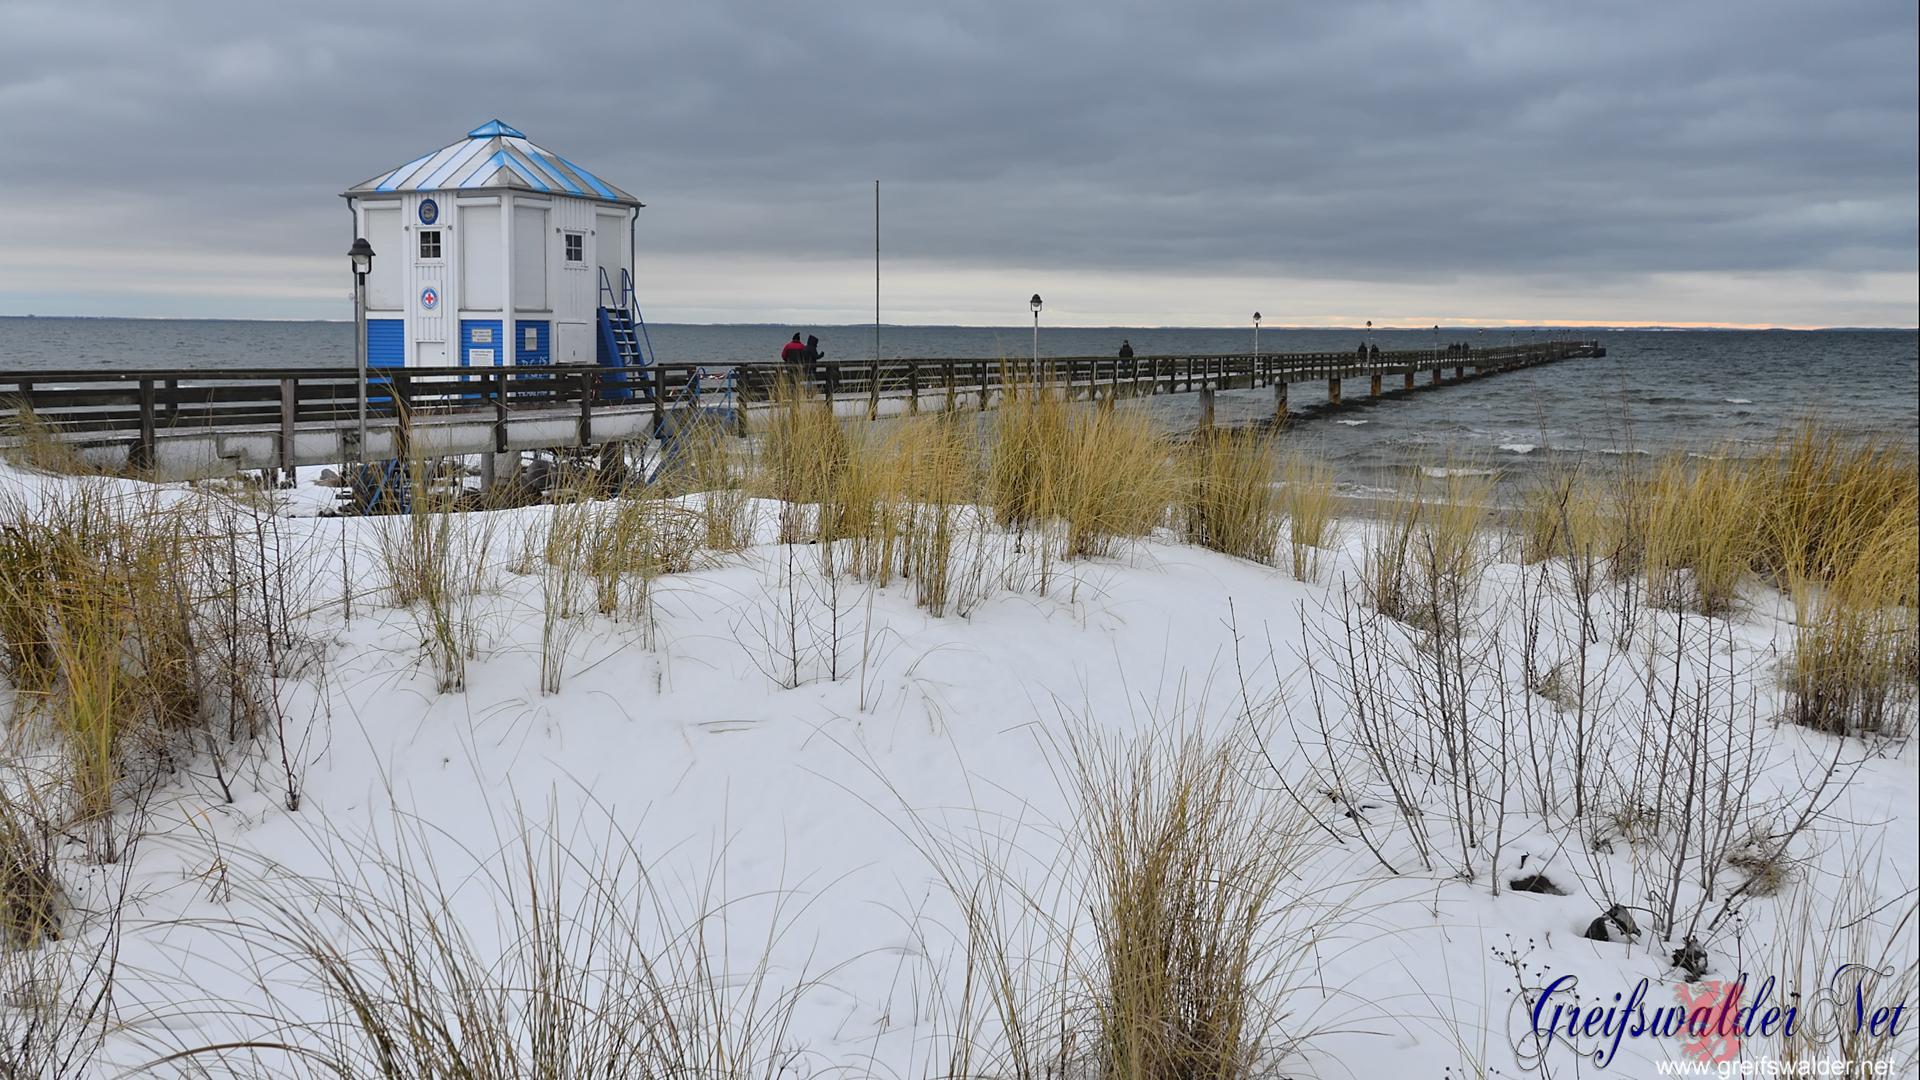 Seebrücke Lubmin im Winter